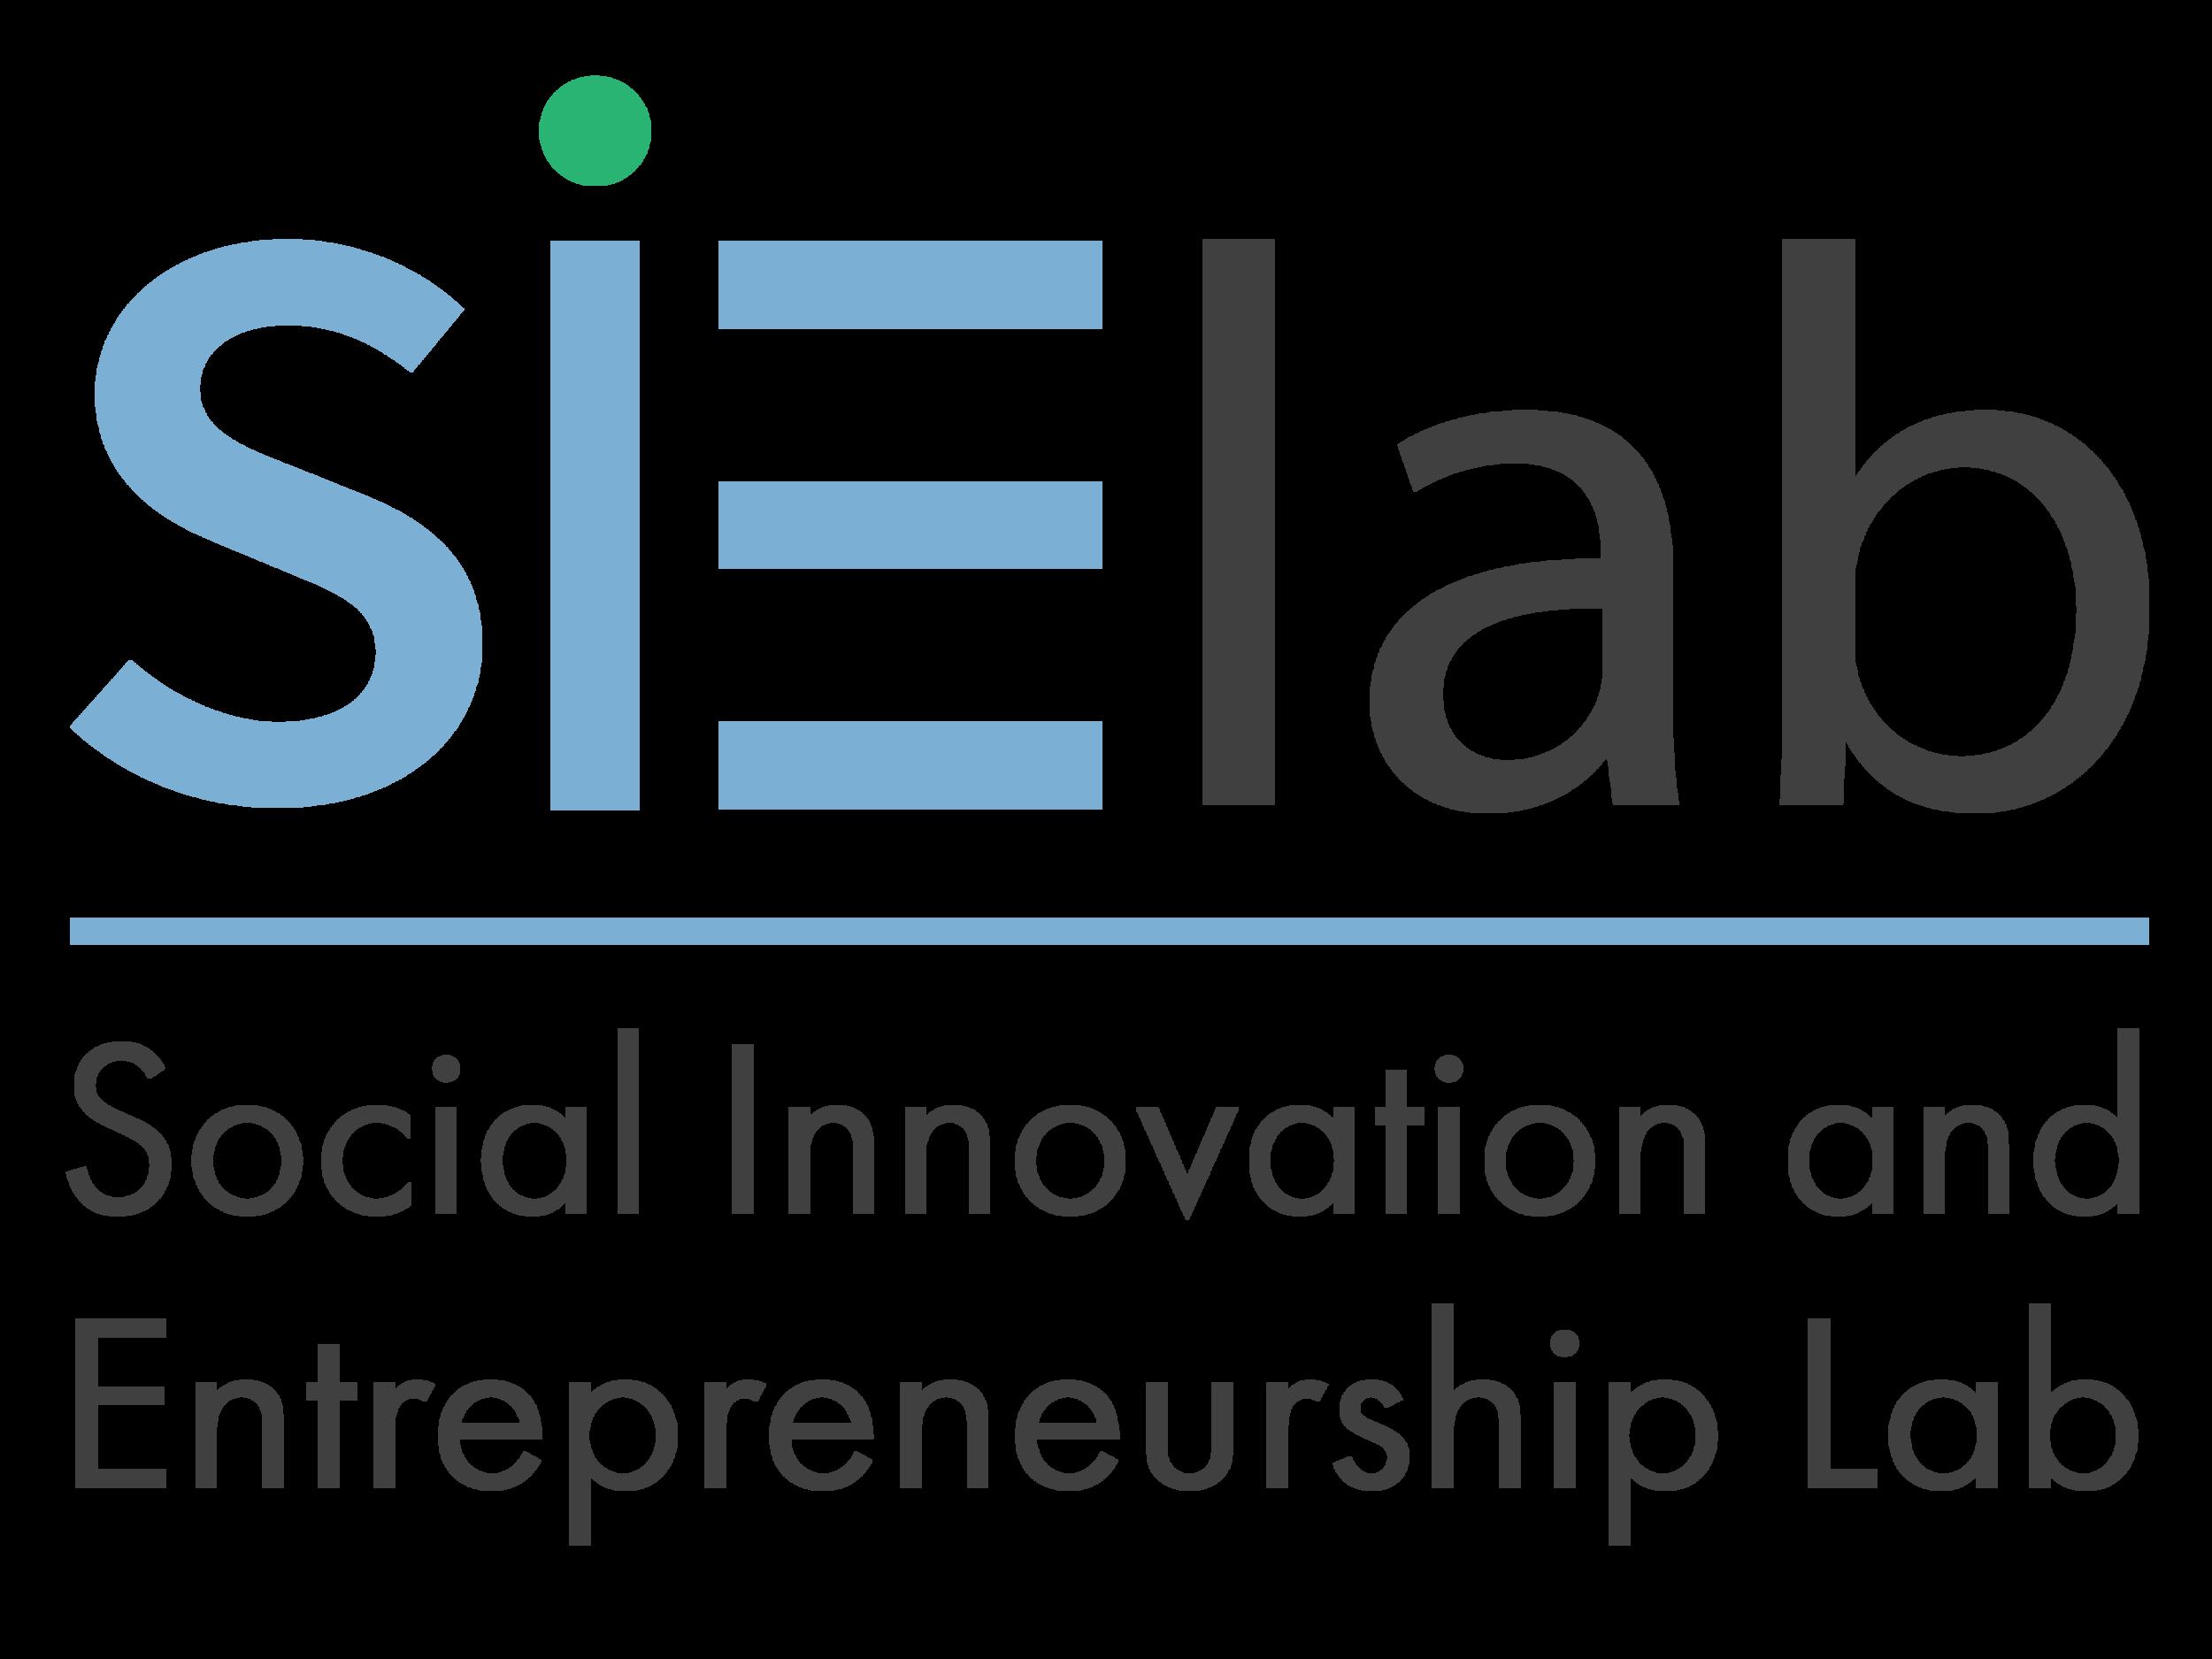 Social Innovation and Entrepreneurship Lab at UNC logo